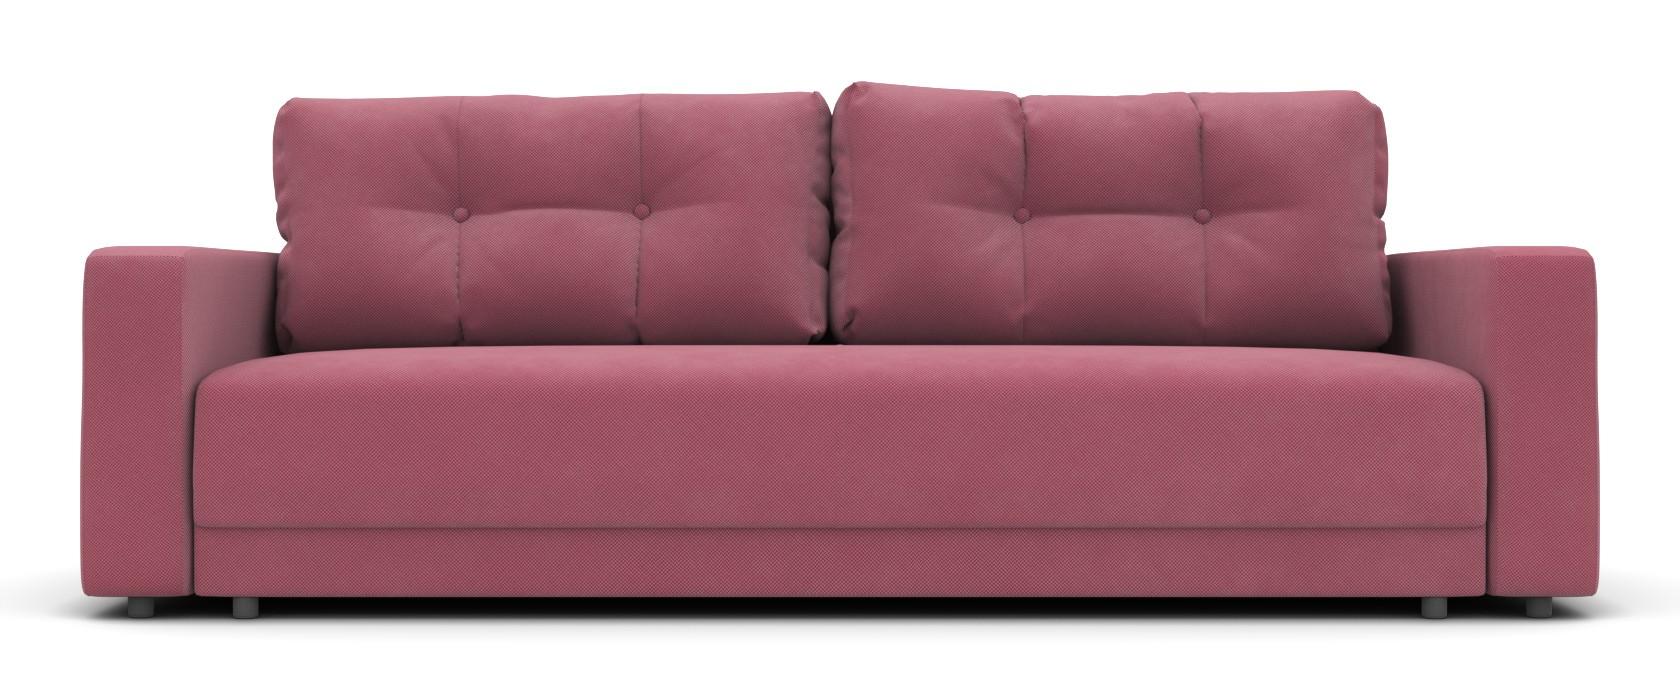 Тримісний диван Famiglia - Pufetto